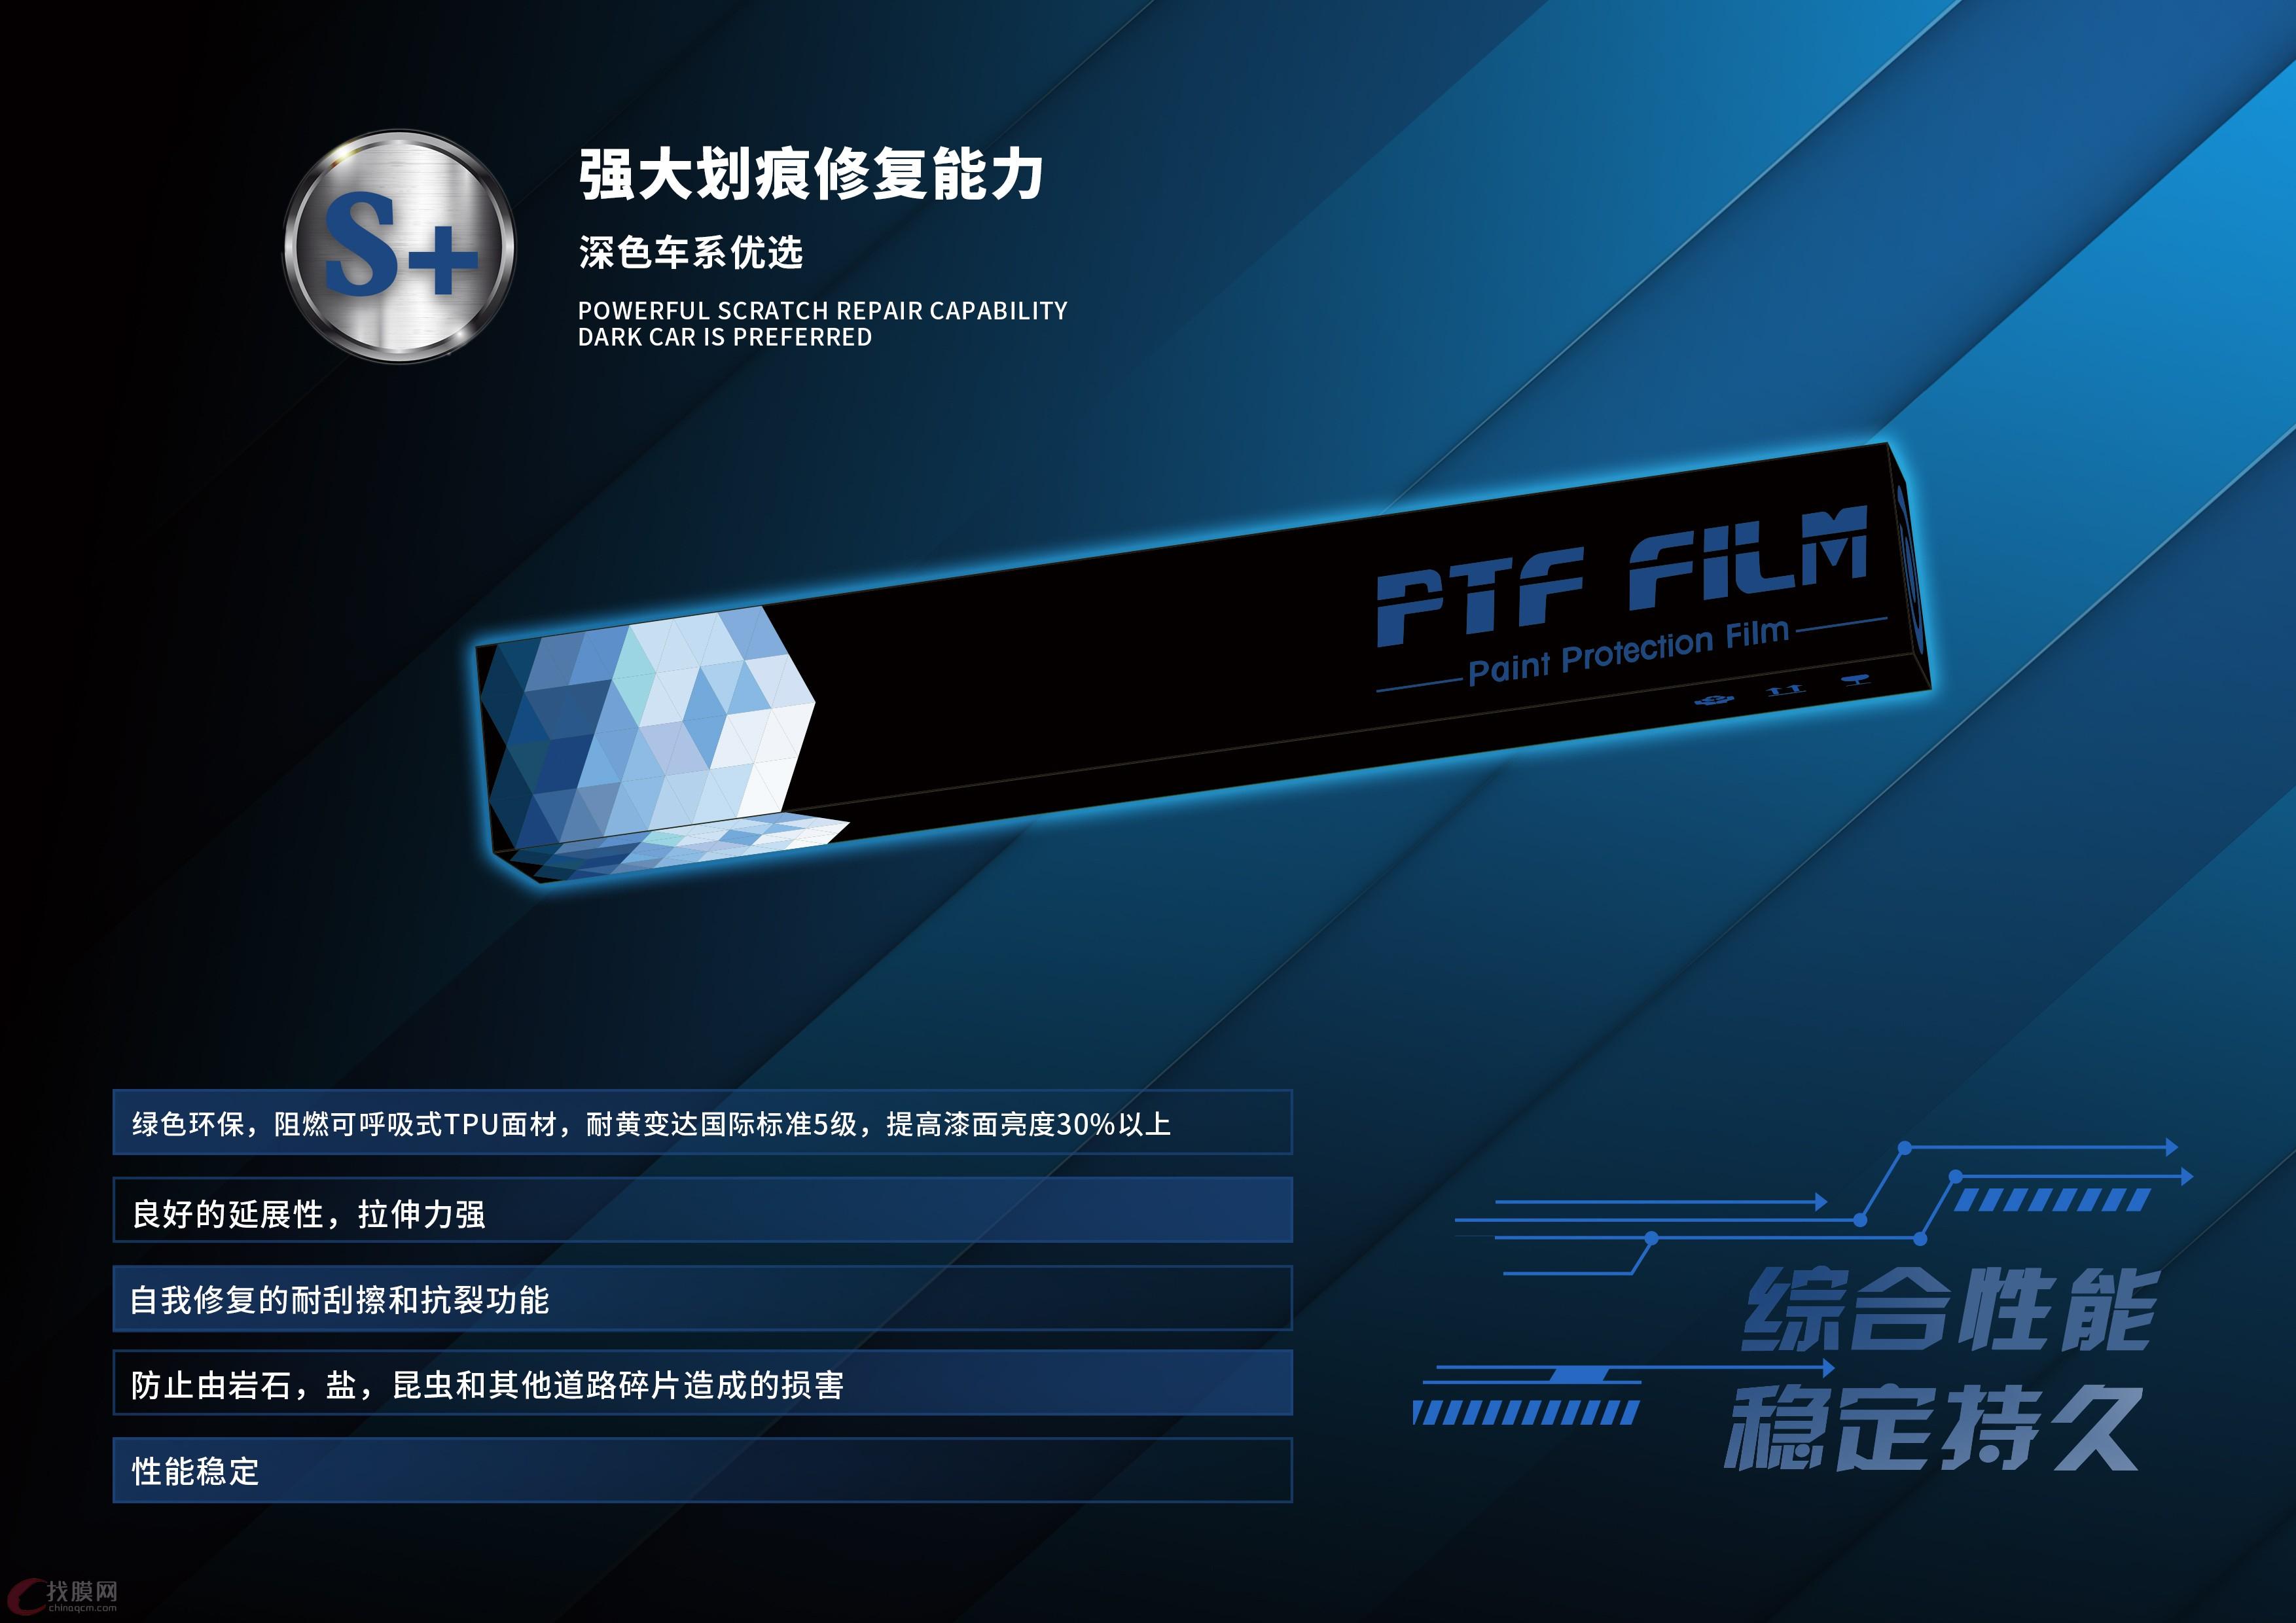 PTF隐形车衣S+系列